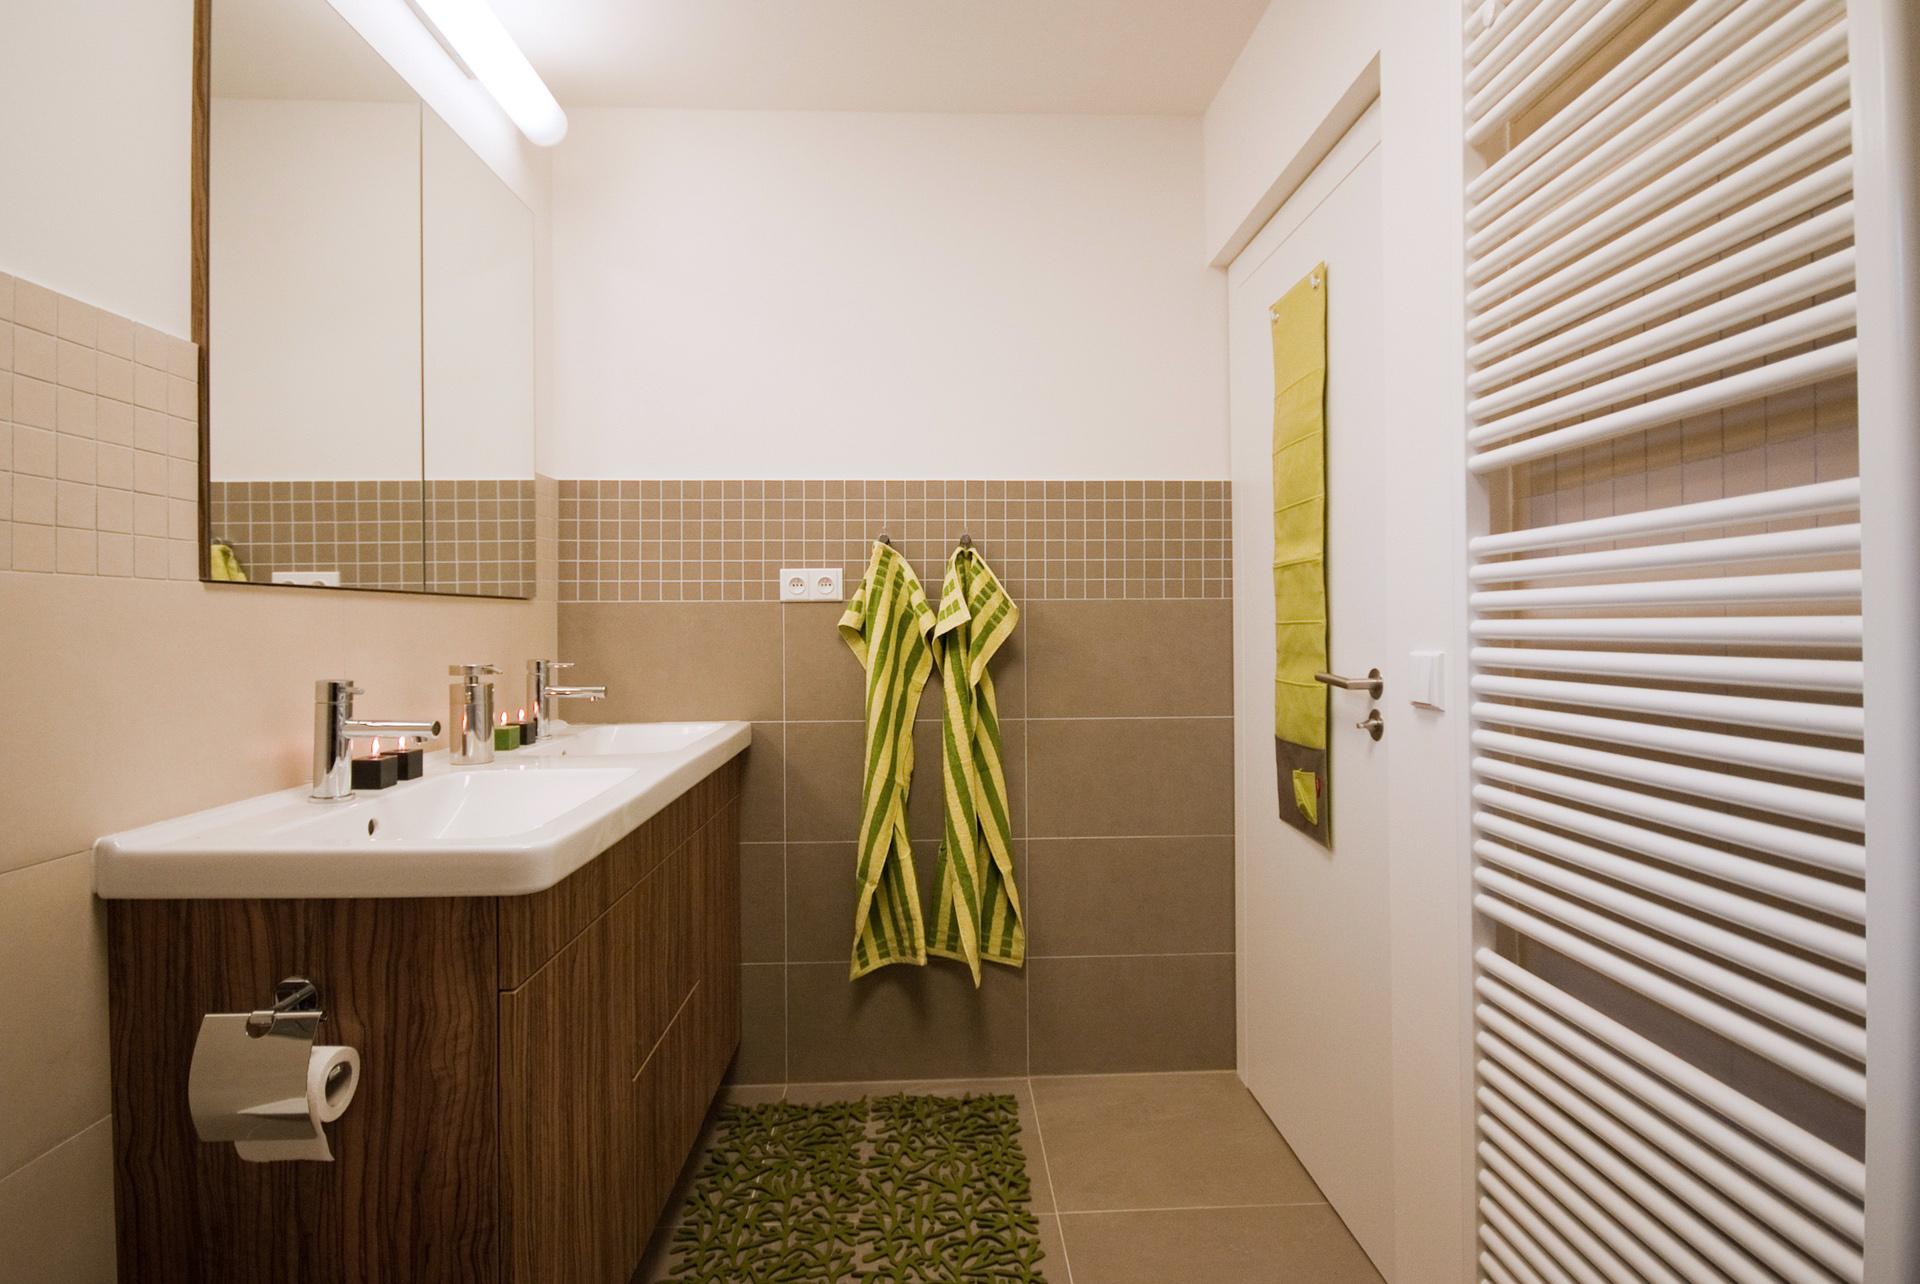 jak se staví sen - koupelna Beroun 3